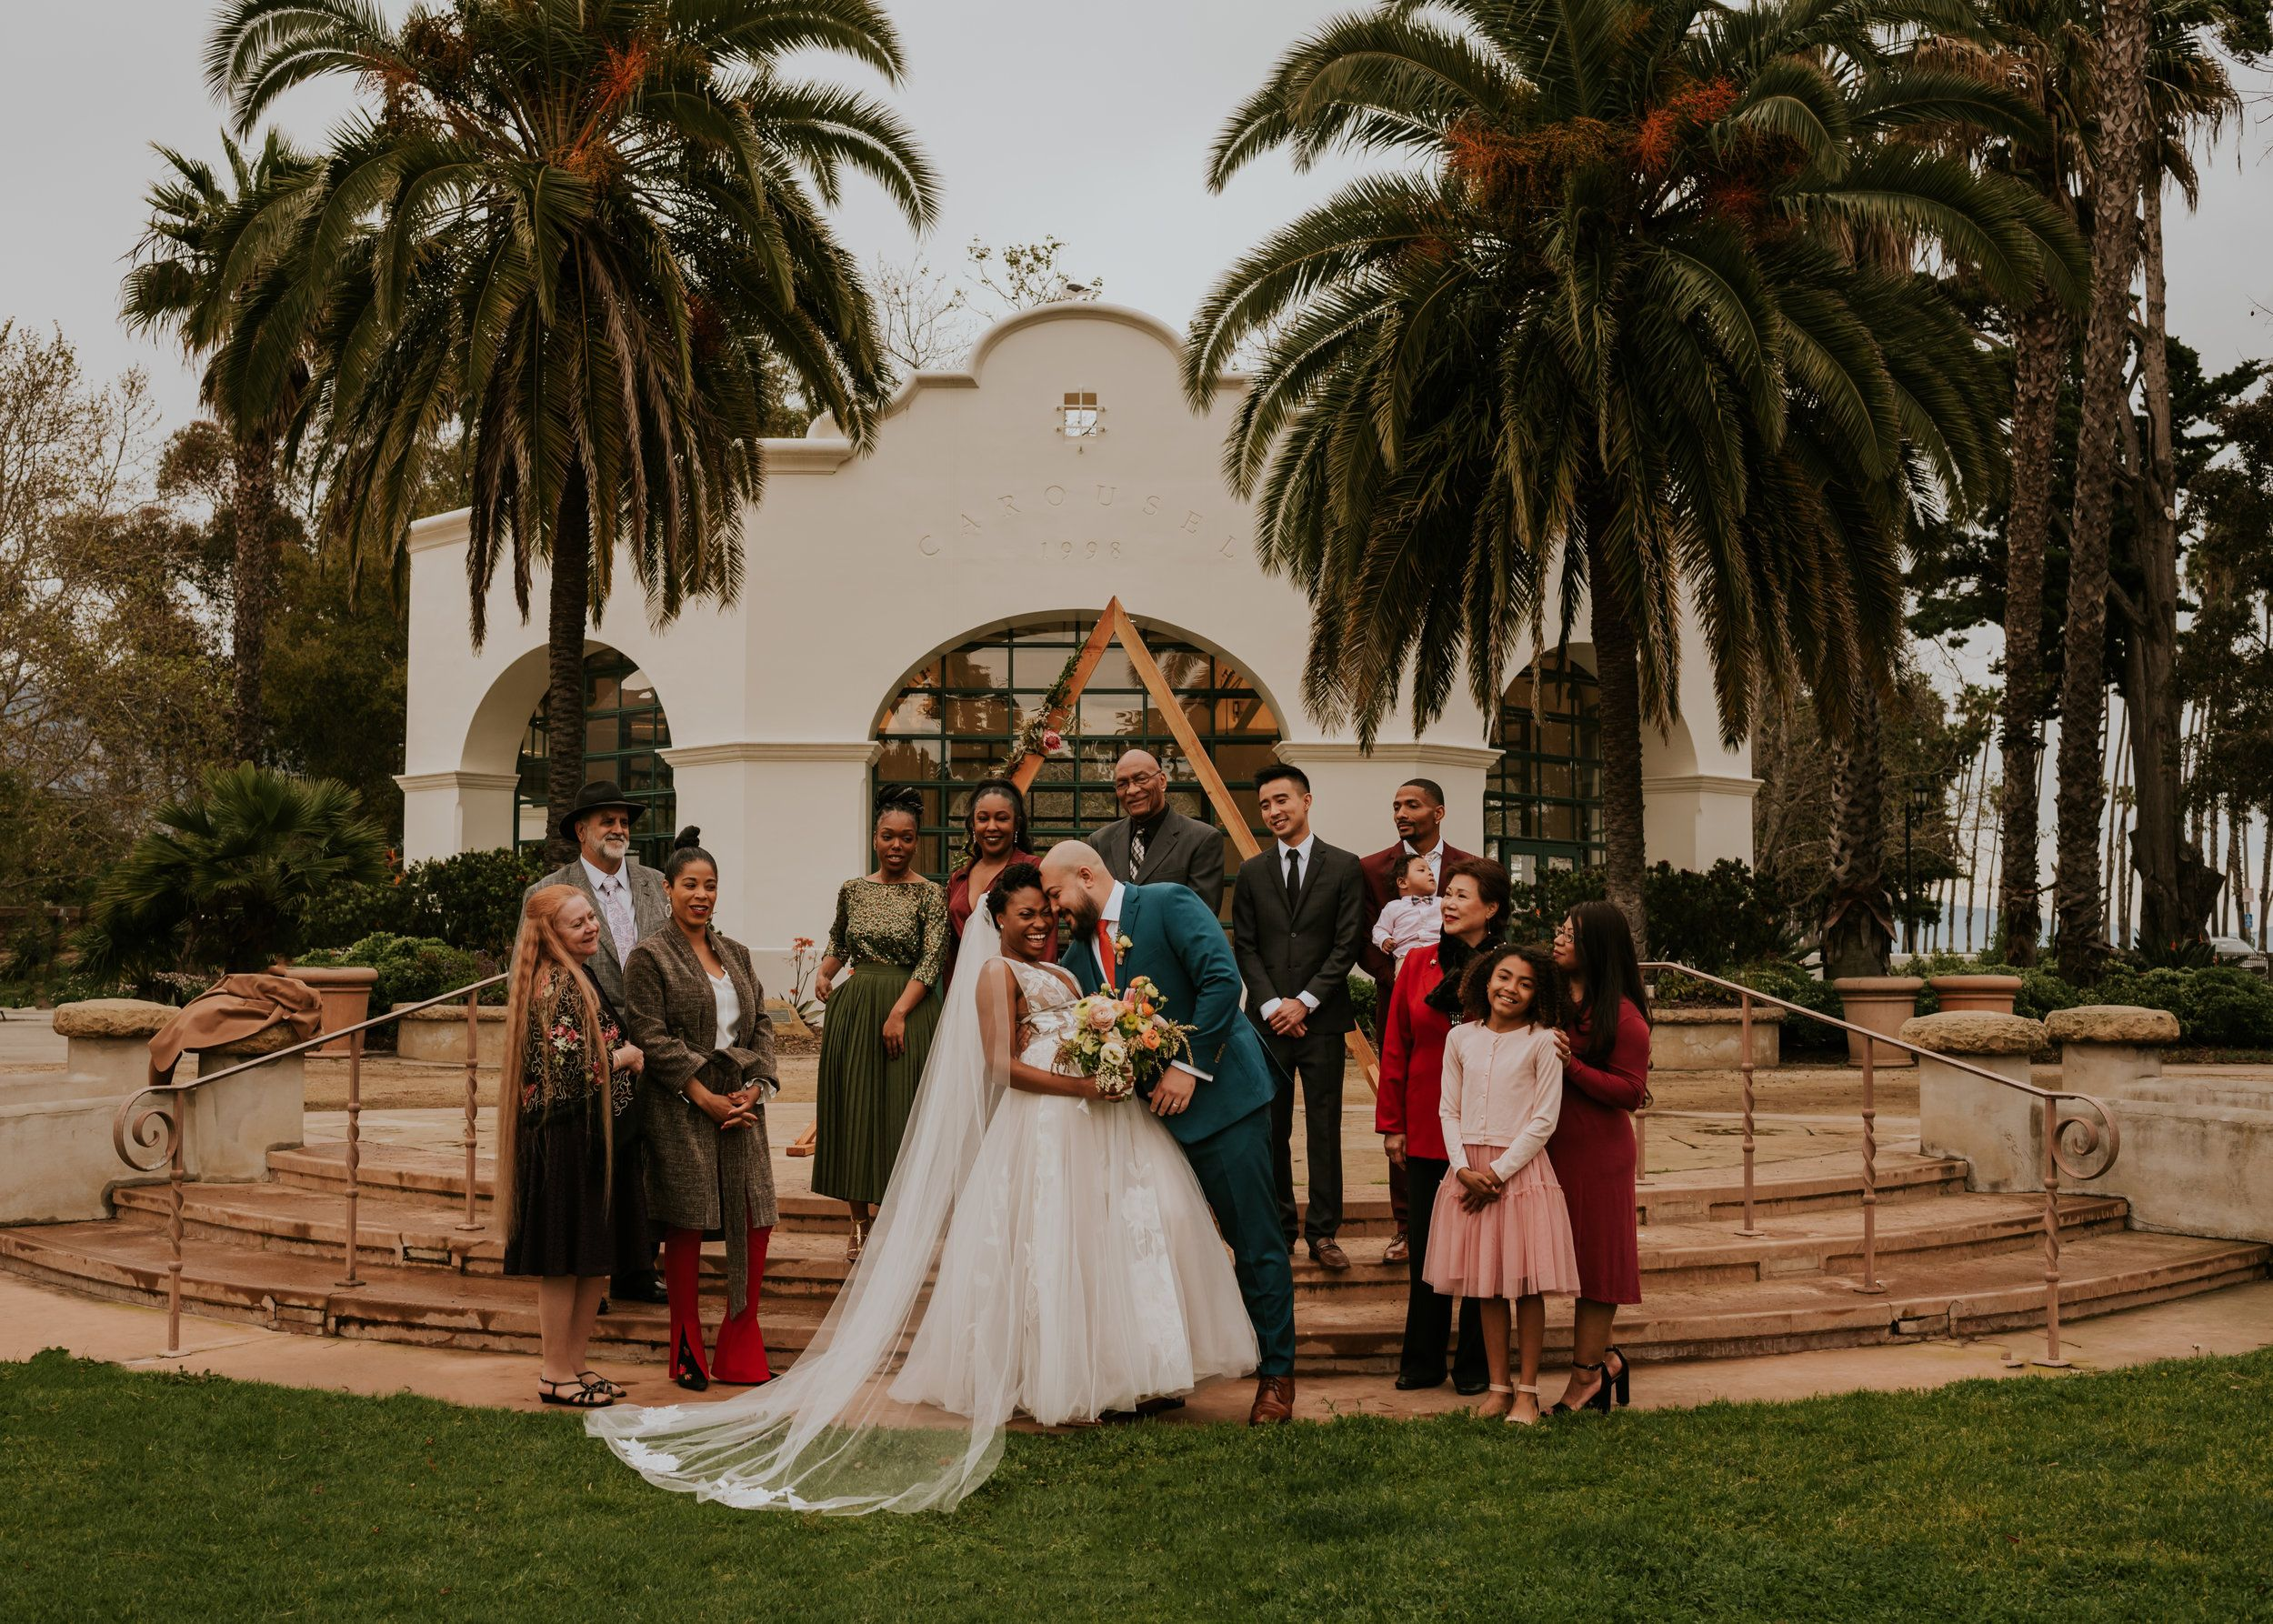 Carousel House Wedding In Santa Barbara California Santa Barbara Santa Barbara Wedding Wedding